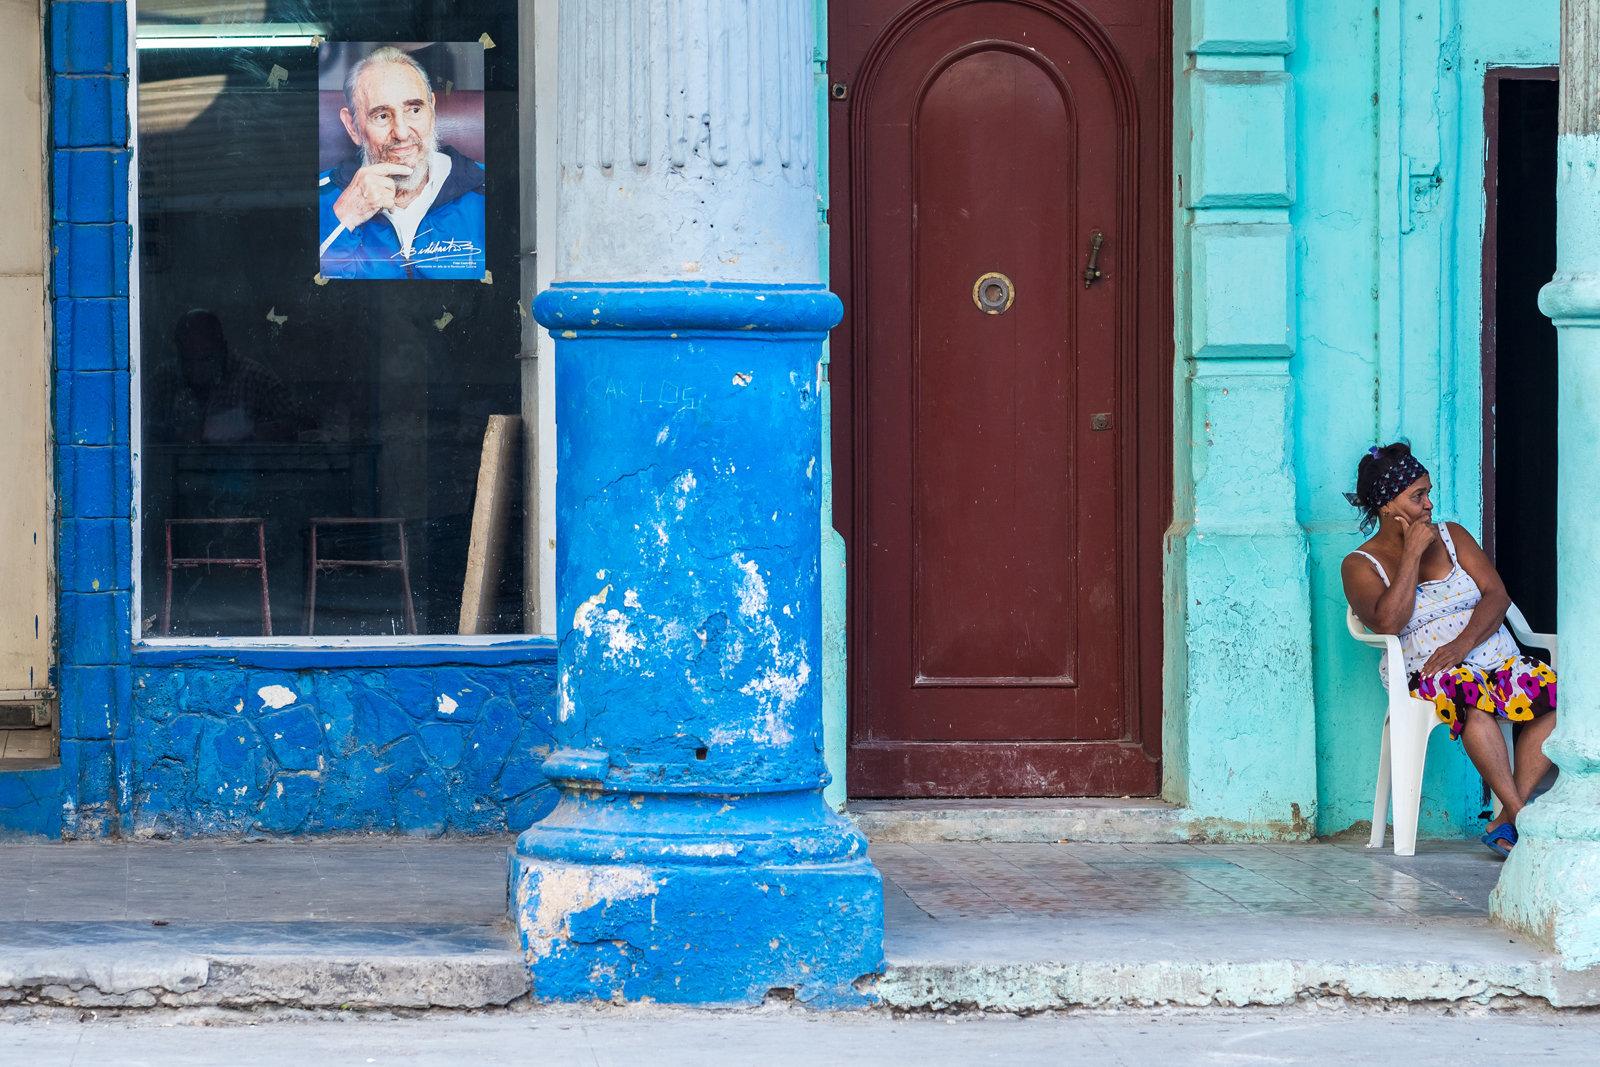 01_Cuba_2014_Erik_Hart_Lensculture_1600px.jpg